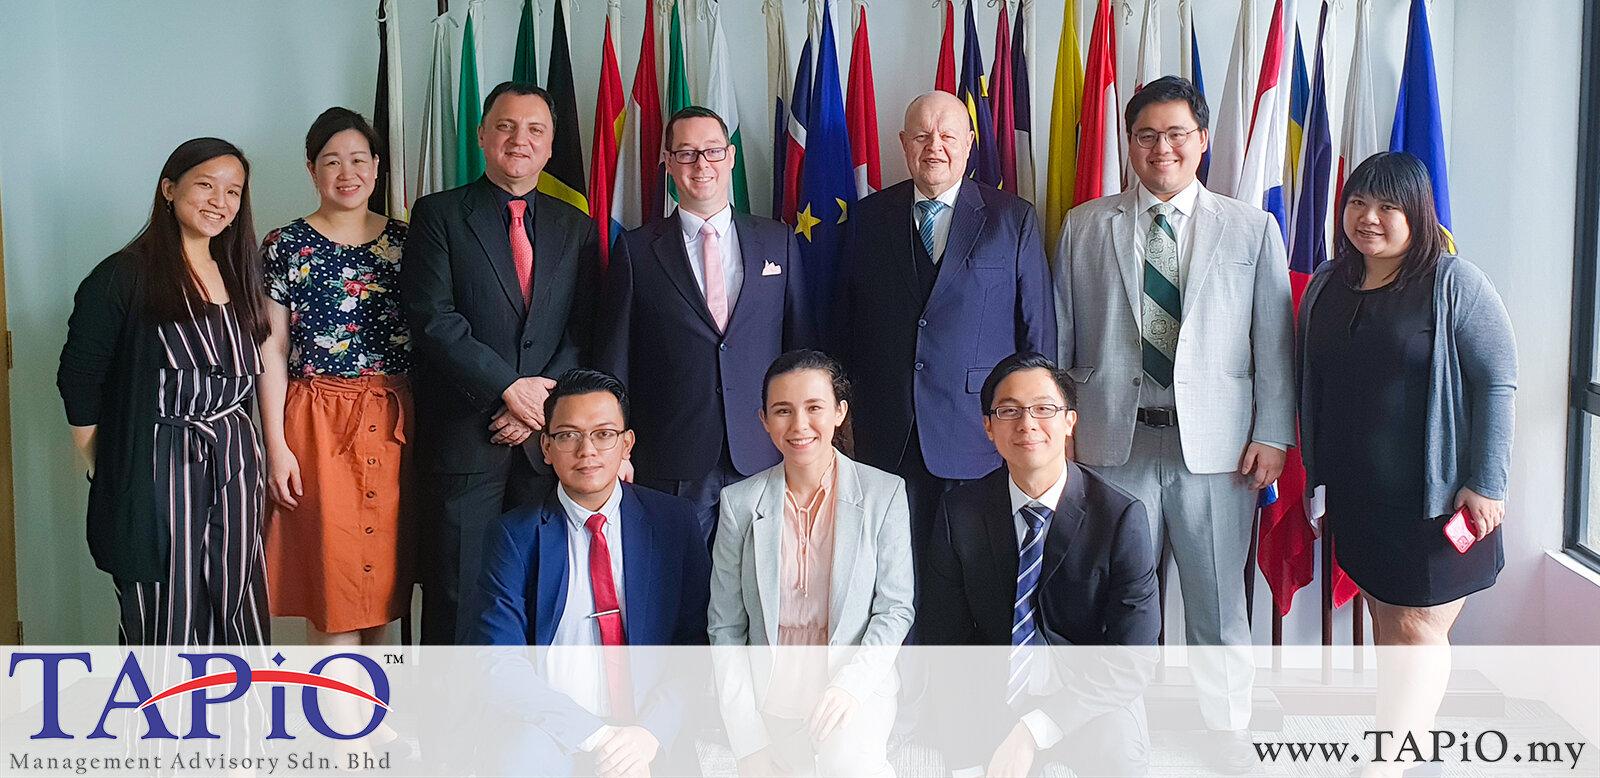 20200707 - Presentation to the EuroCham (EUMCCI)